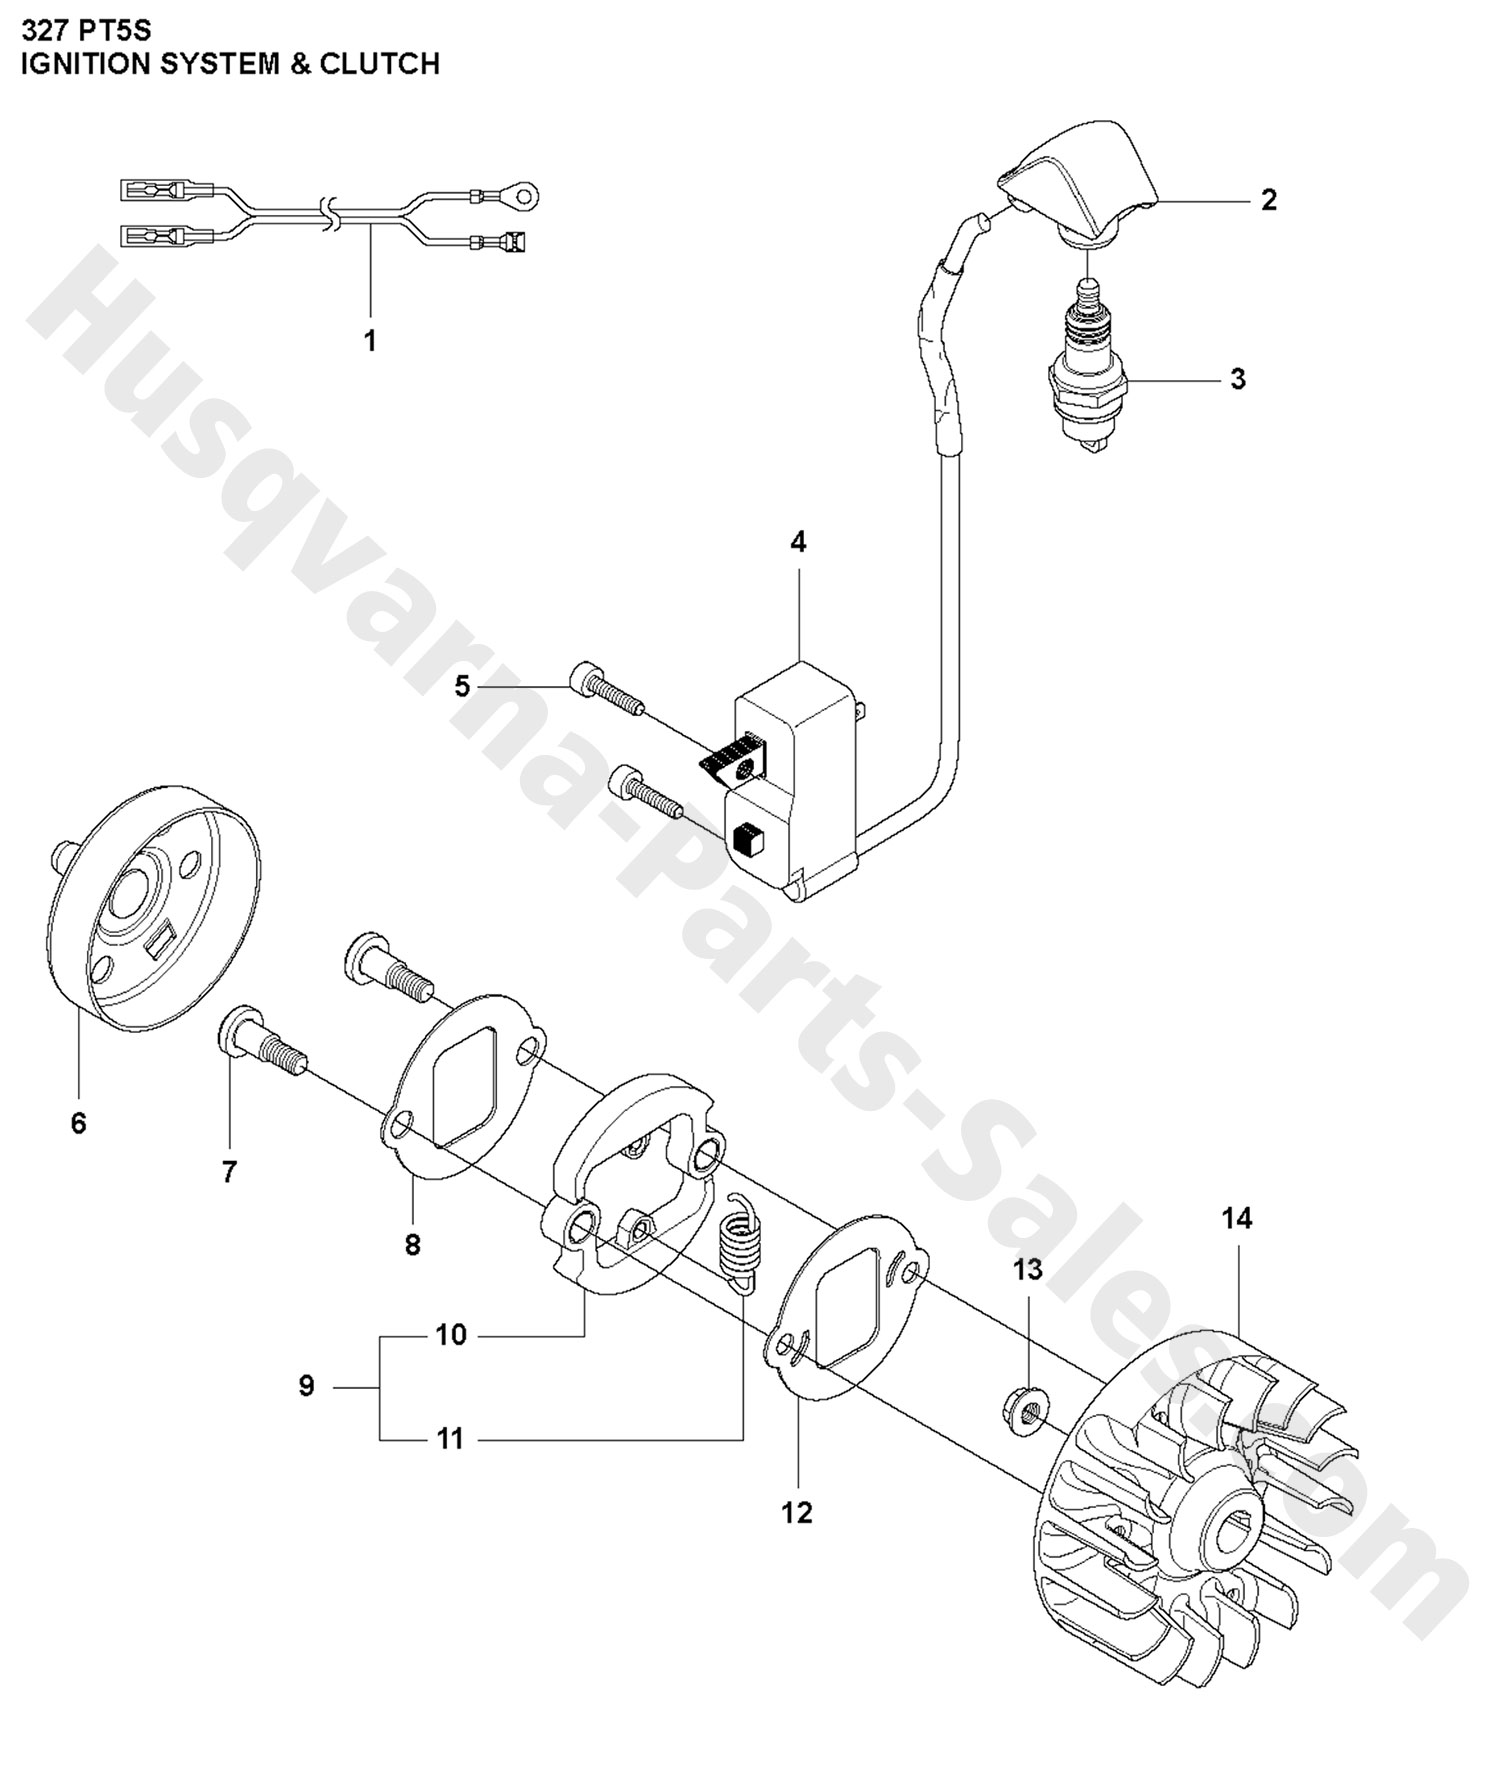 327PT5S Husqvarna Pole Saw Ignition System & Clutch Parts